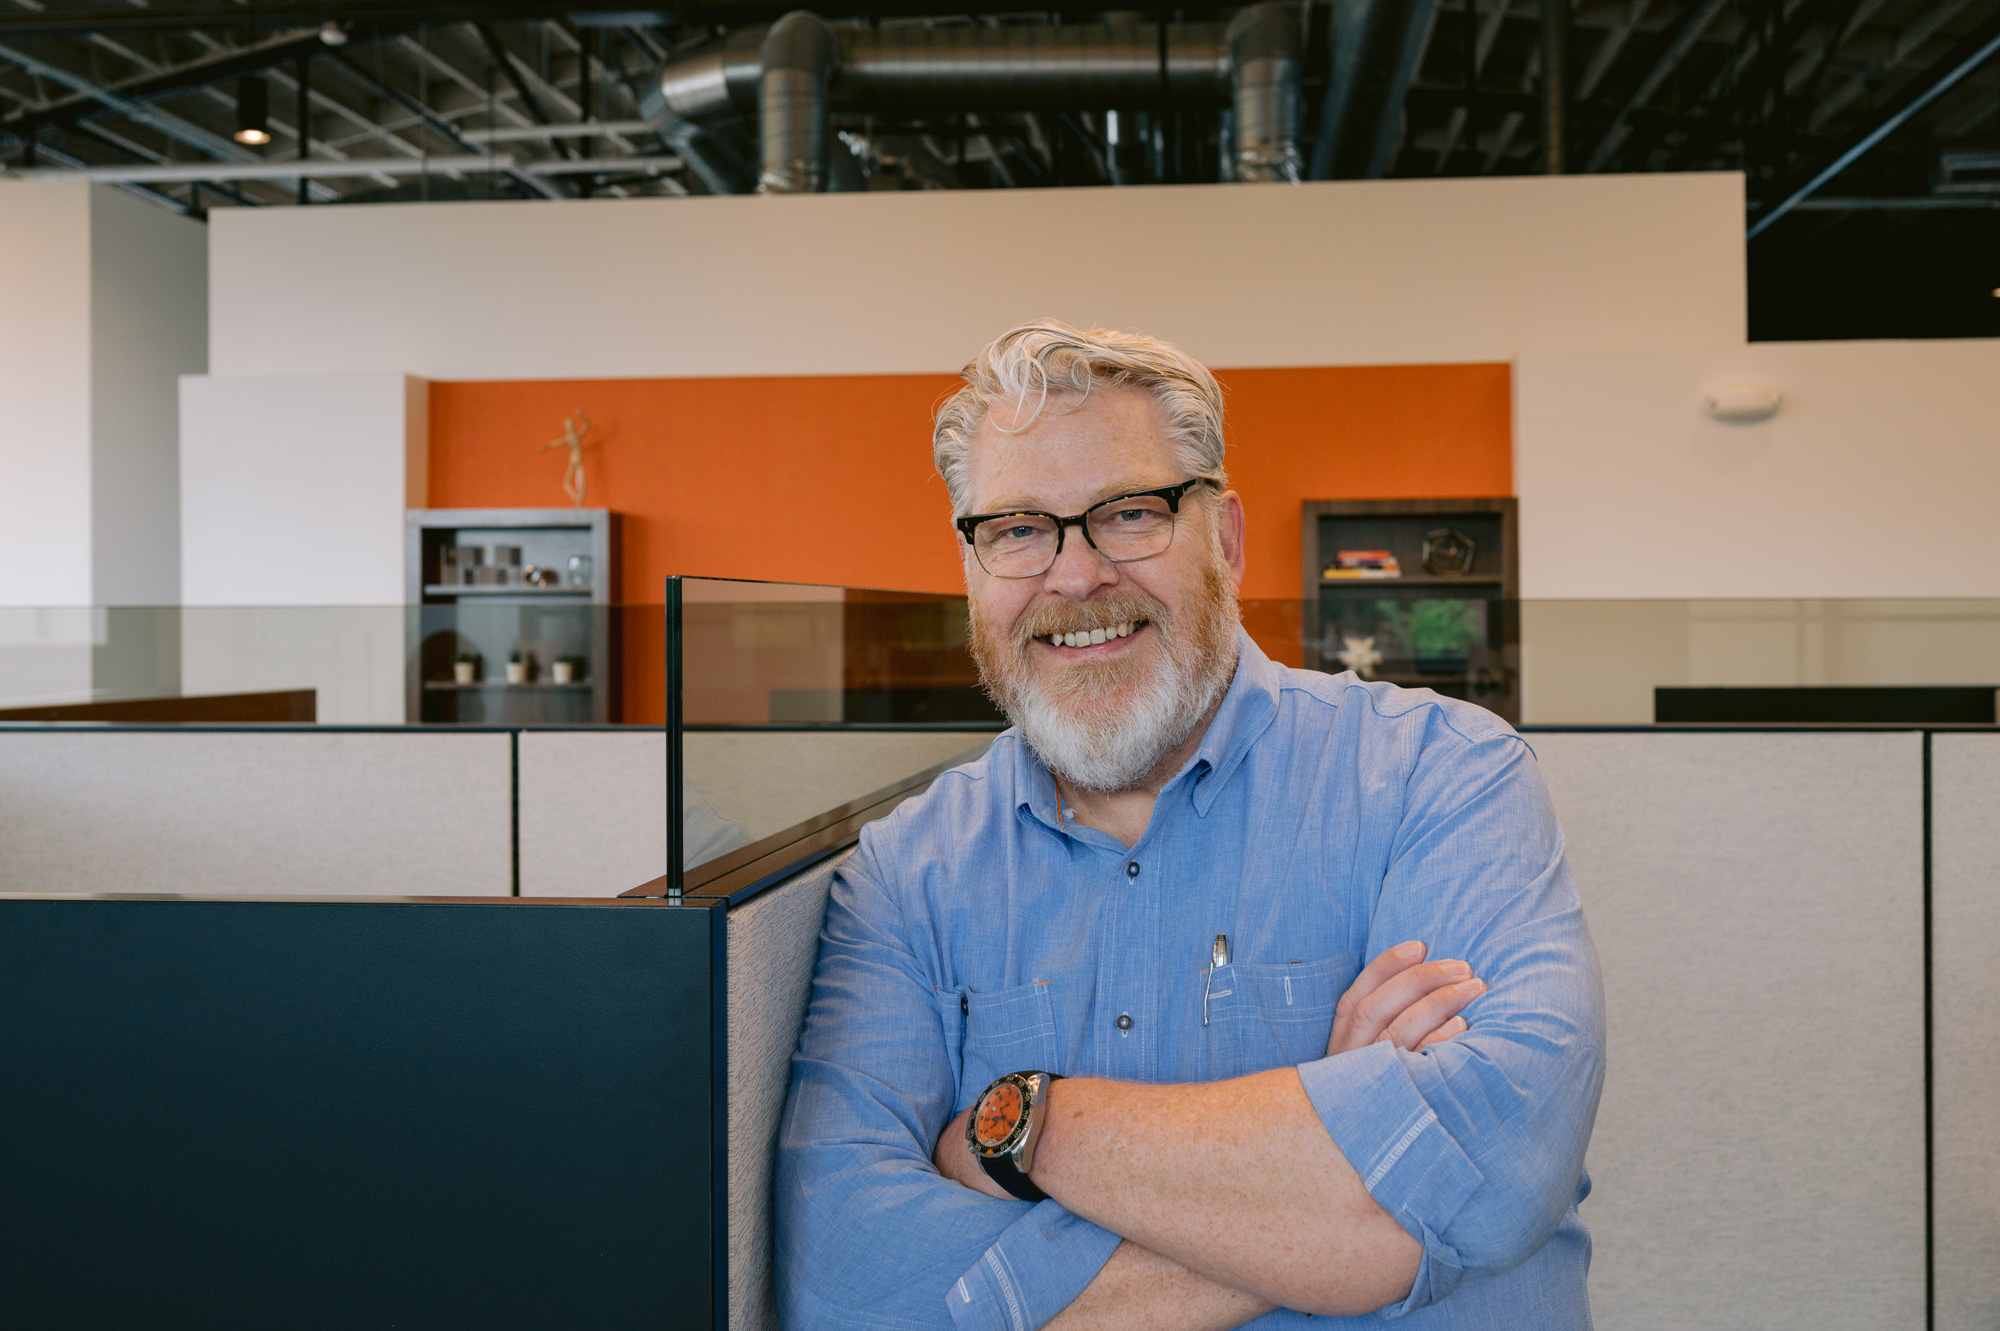 Jamey Boiter, CEO of BOLTGROUP